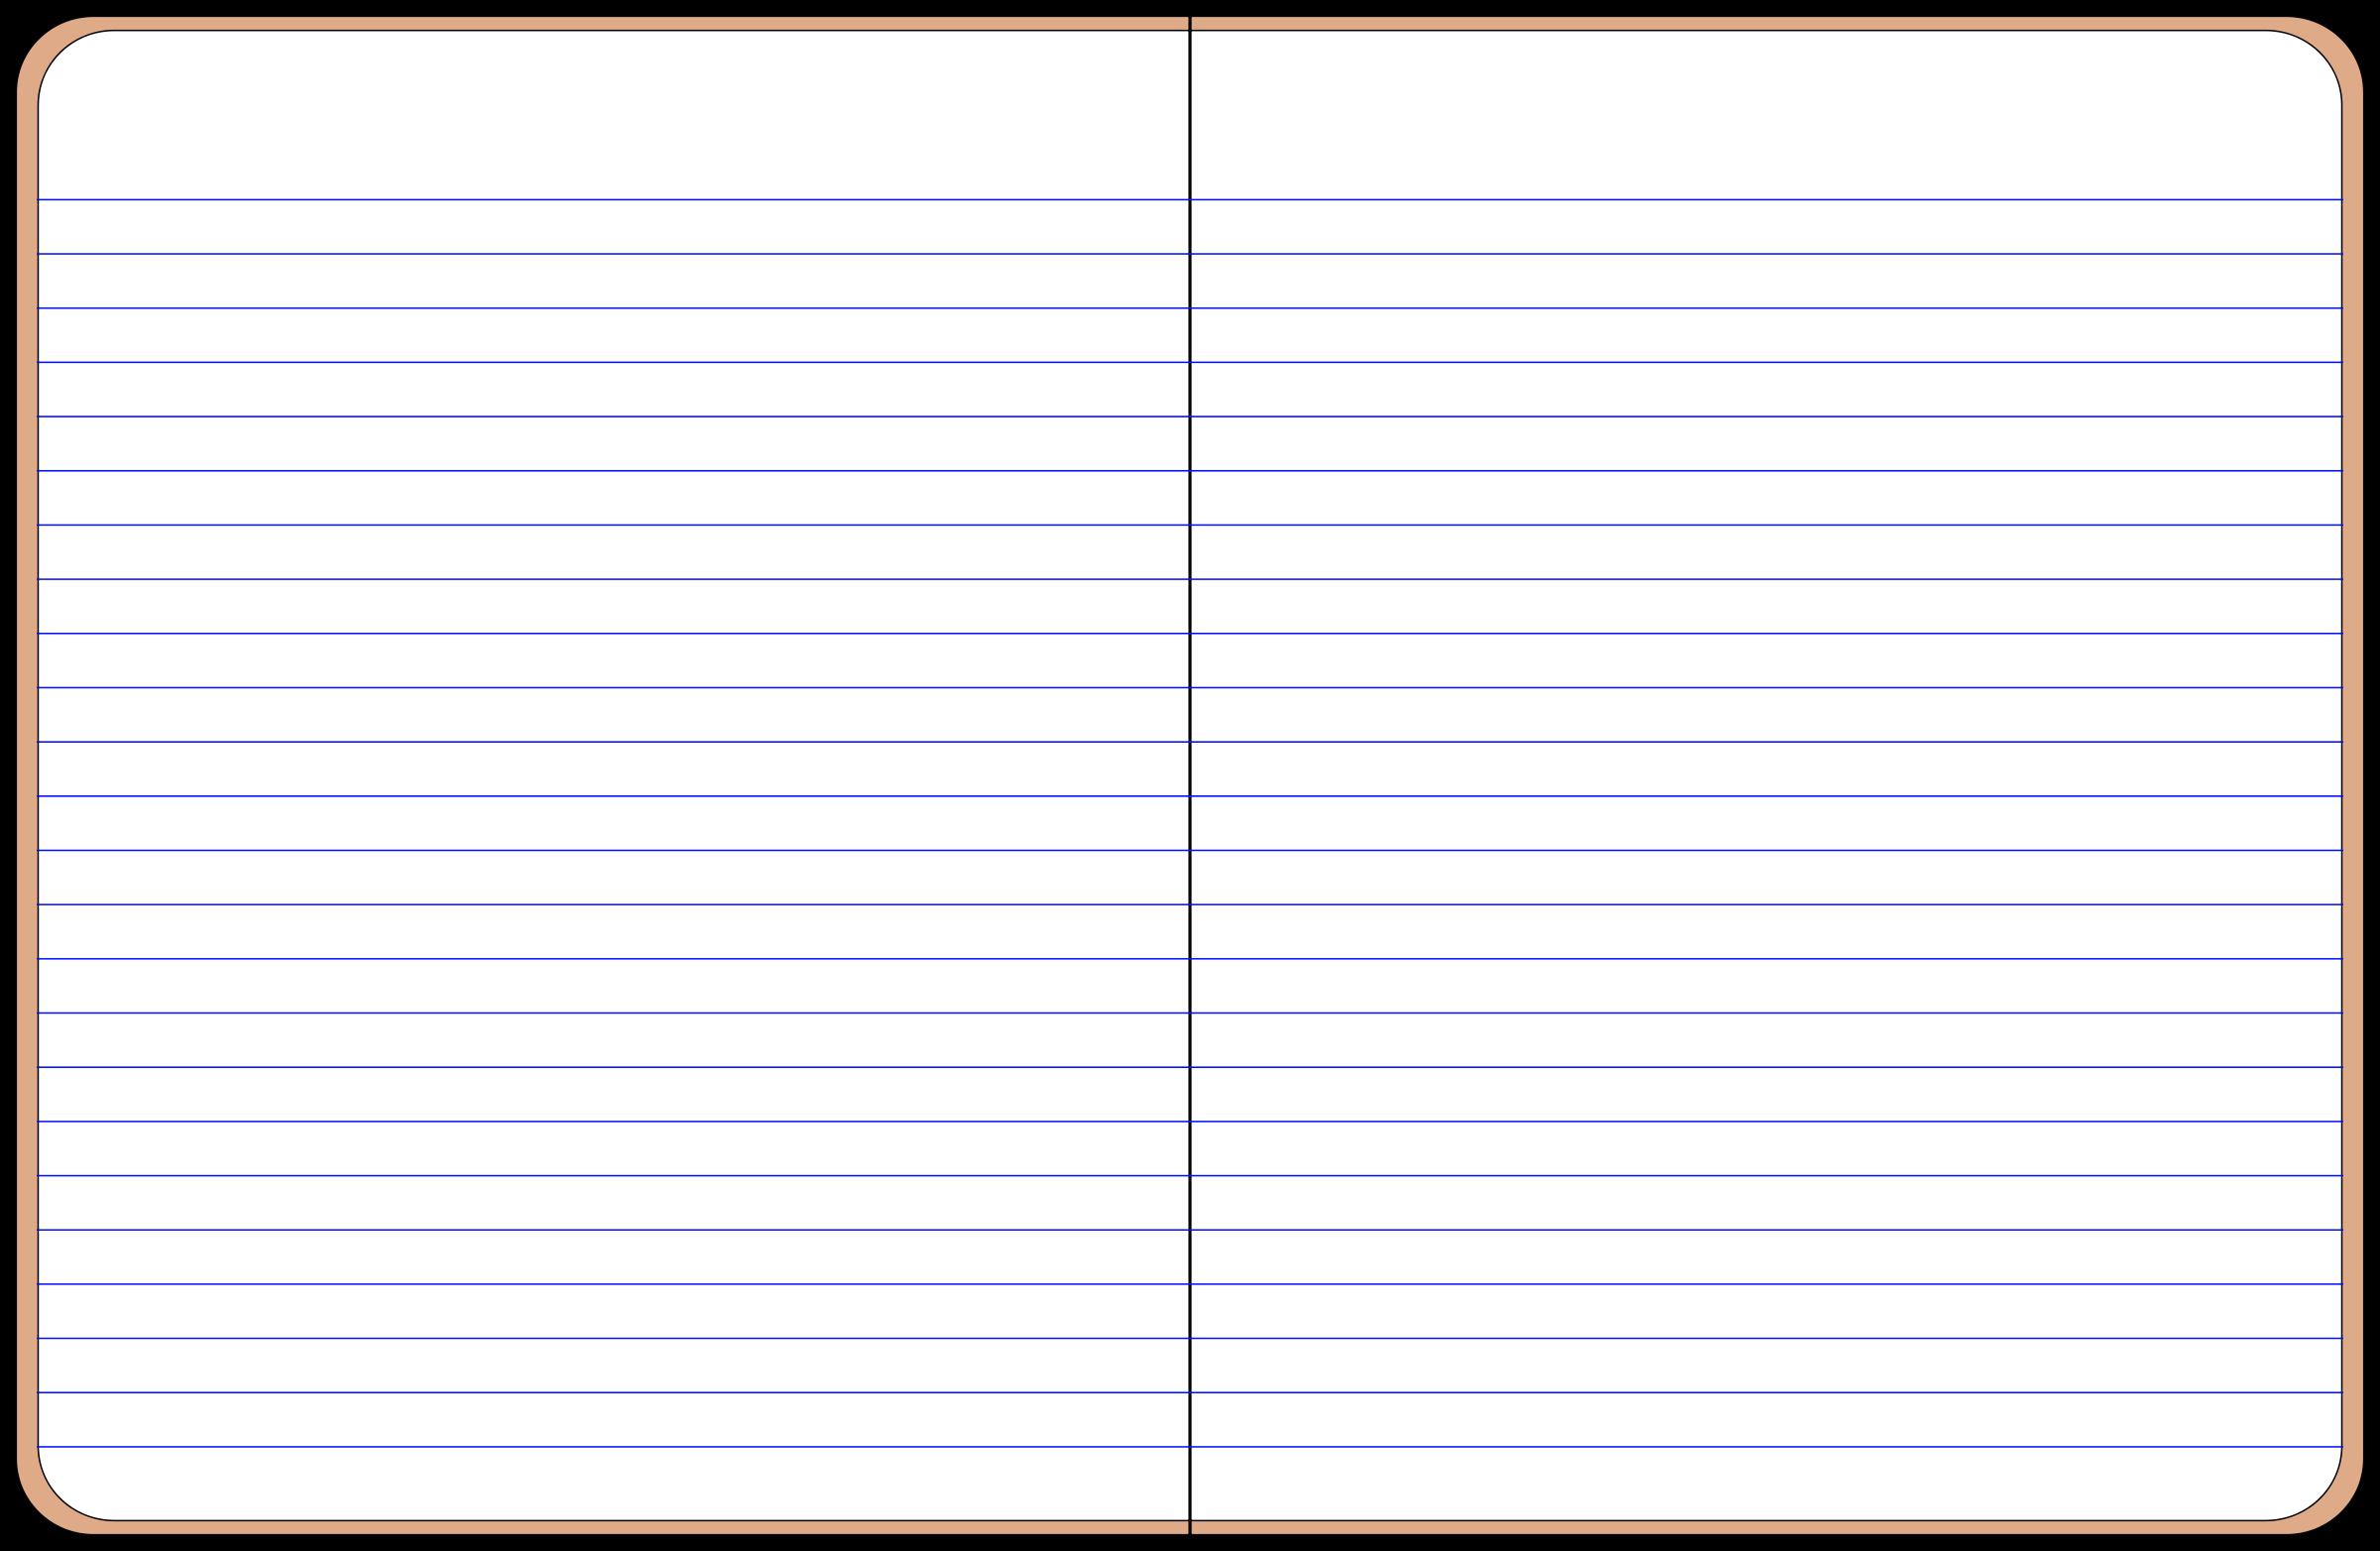 Images For Open Notebook .-Images For Open Notebook .-14